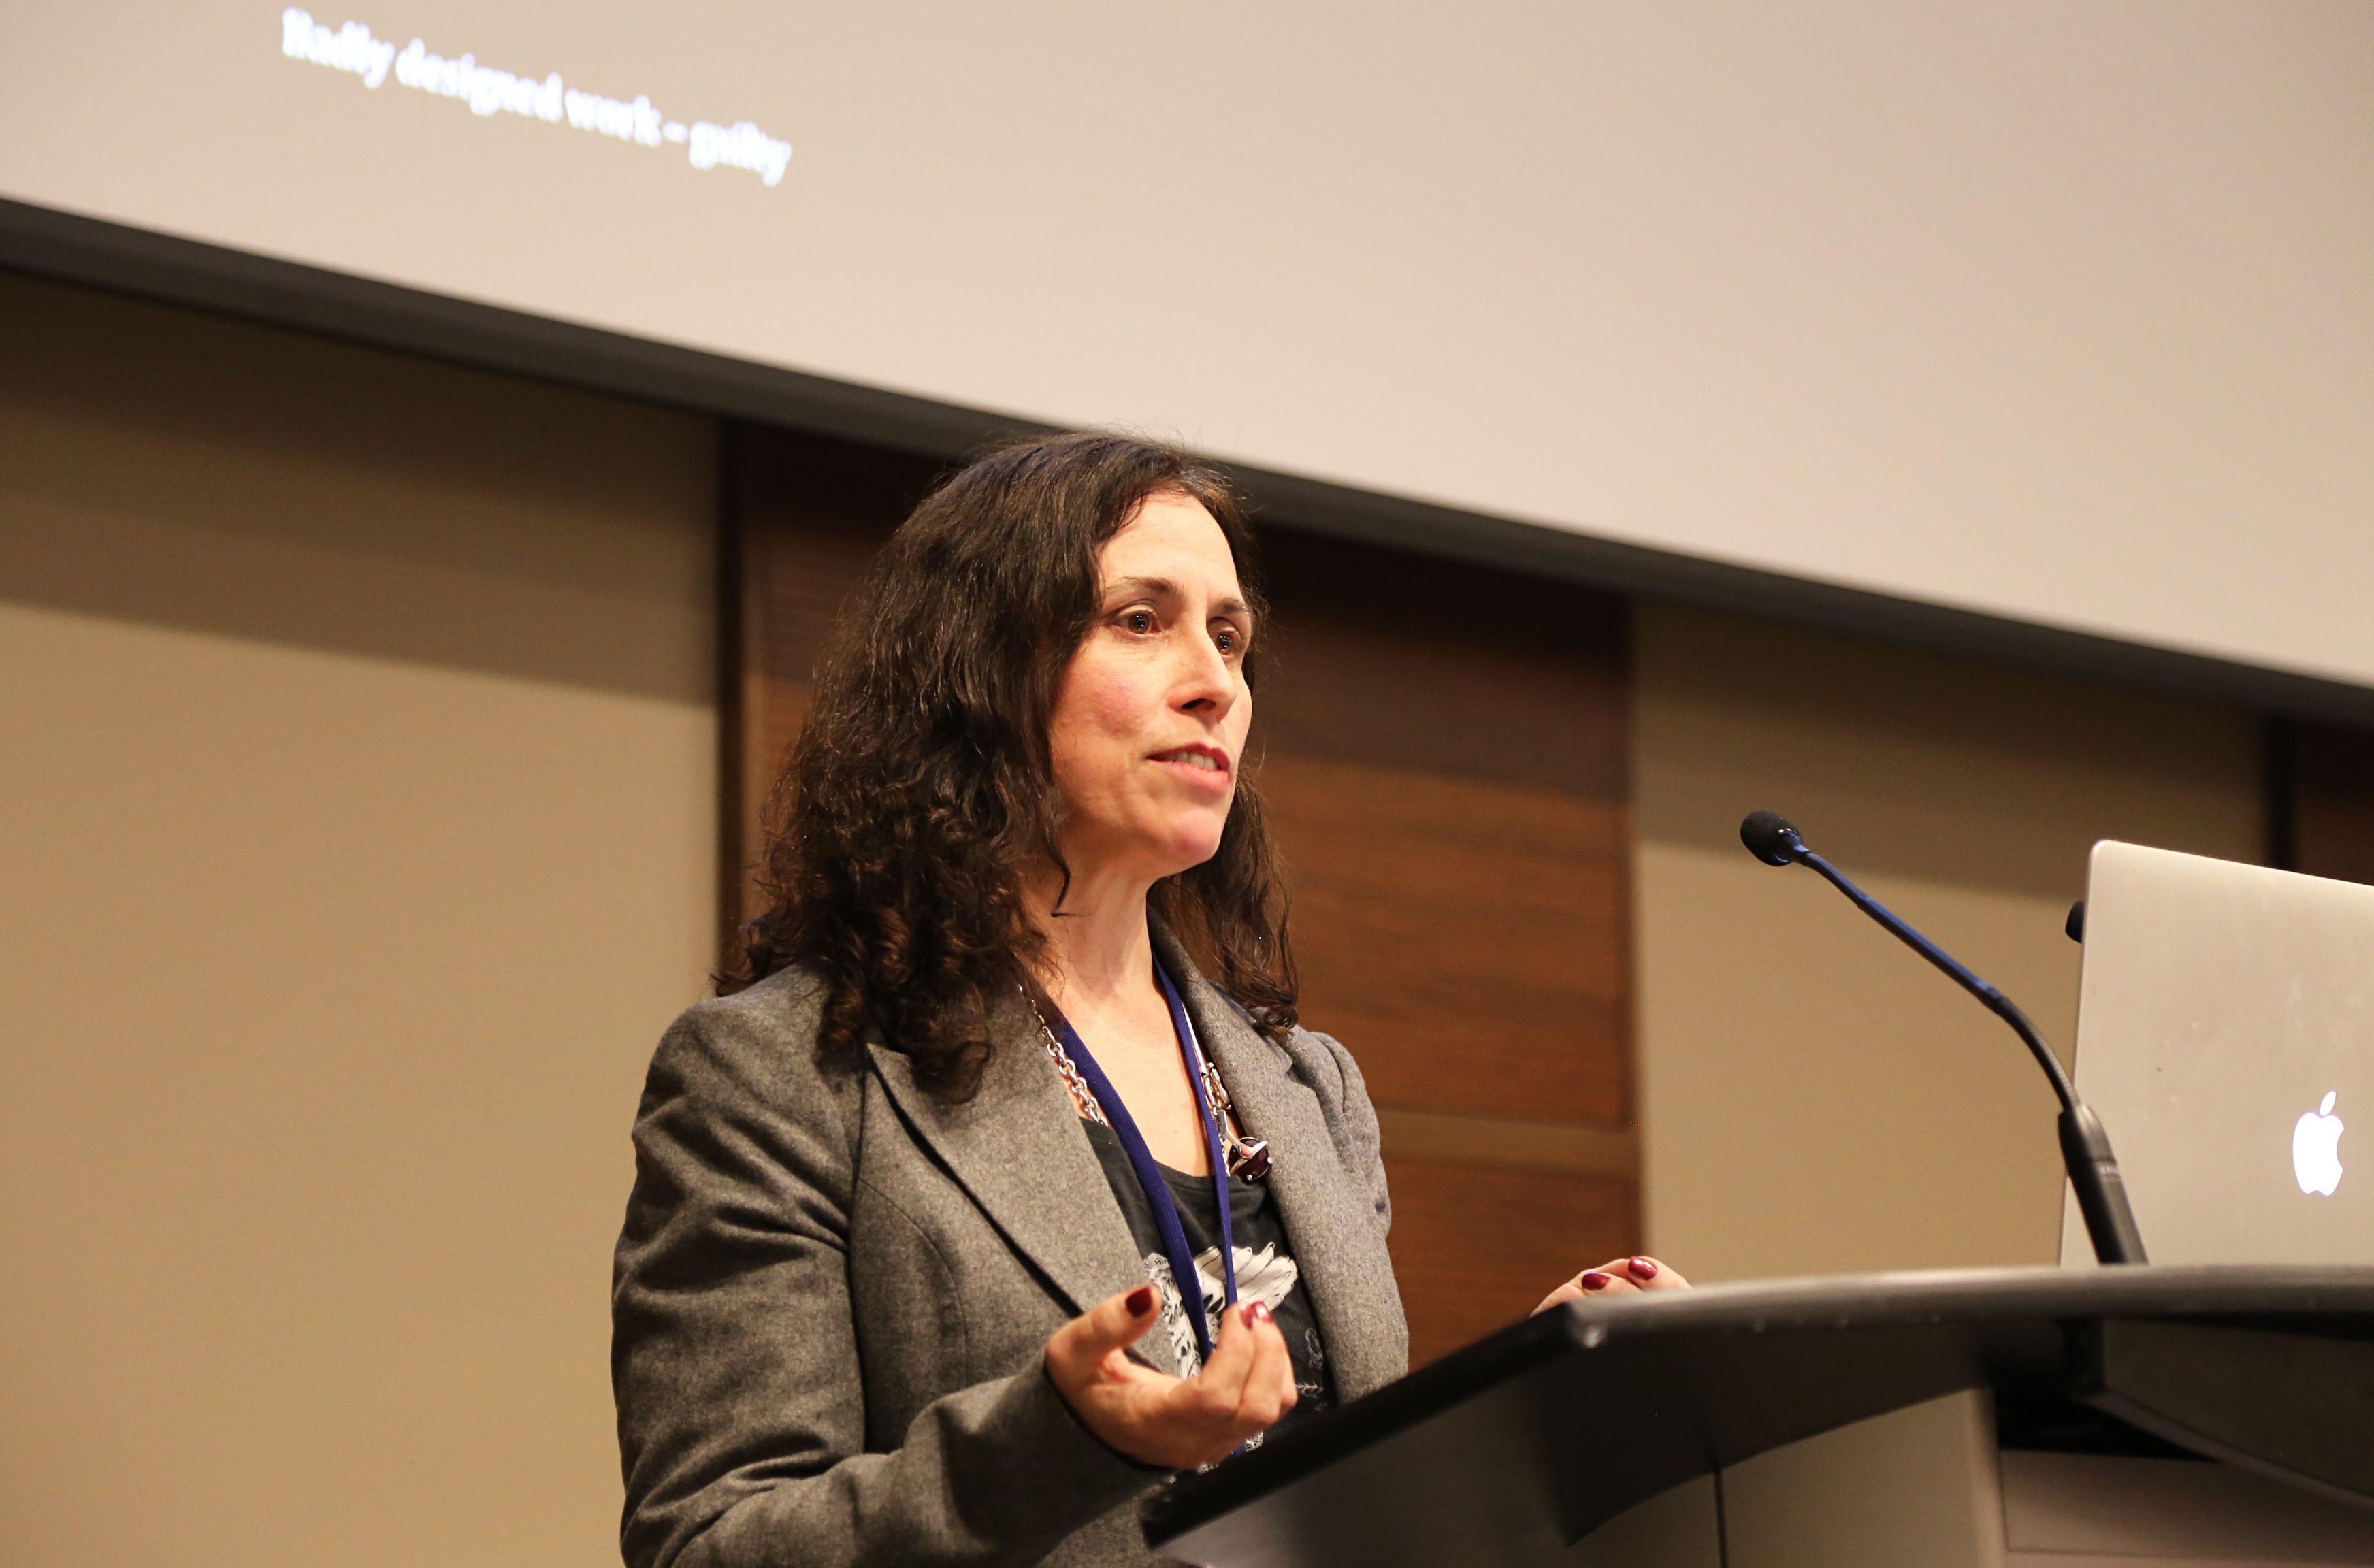 Caitlin Fisher - ebookcraft 2014 - BookNet Canada & eBOUND Canada  (c) Yvonne Bambrick http://www.booknetcanada.ca/technology-forum/